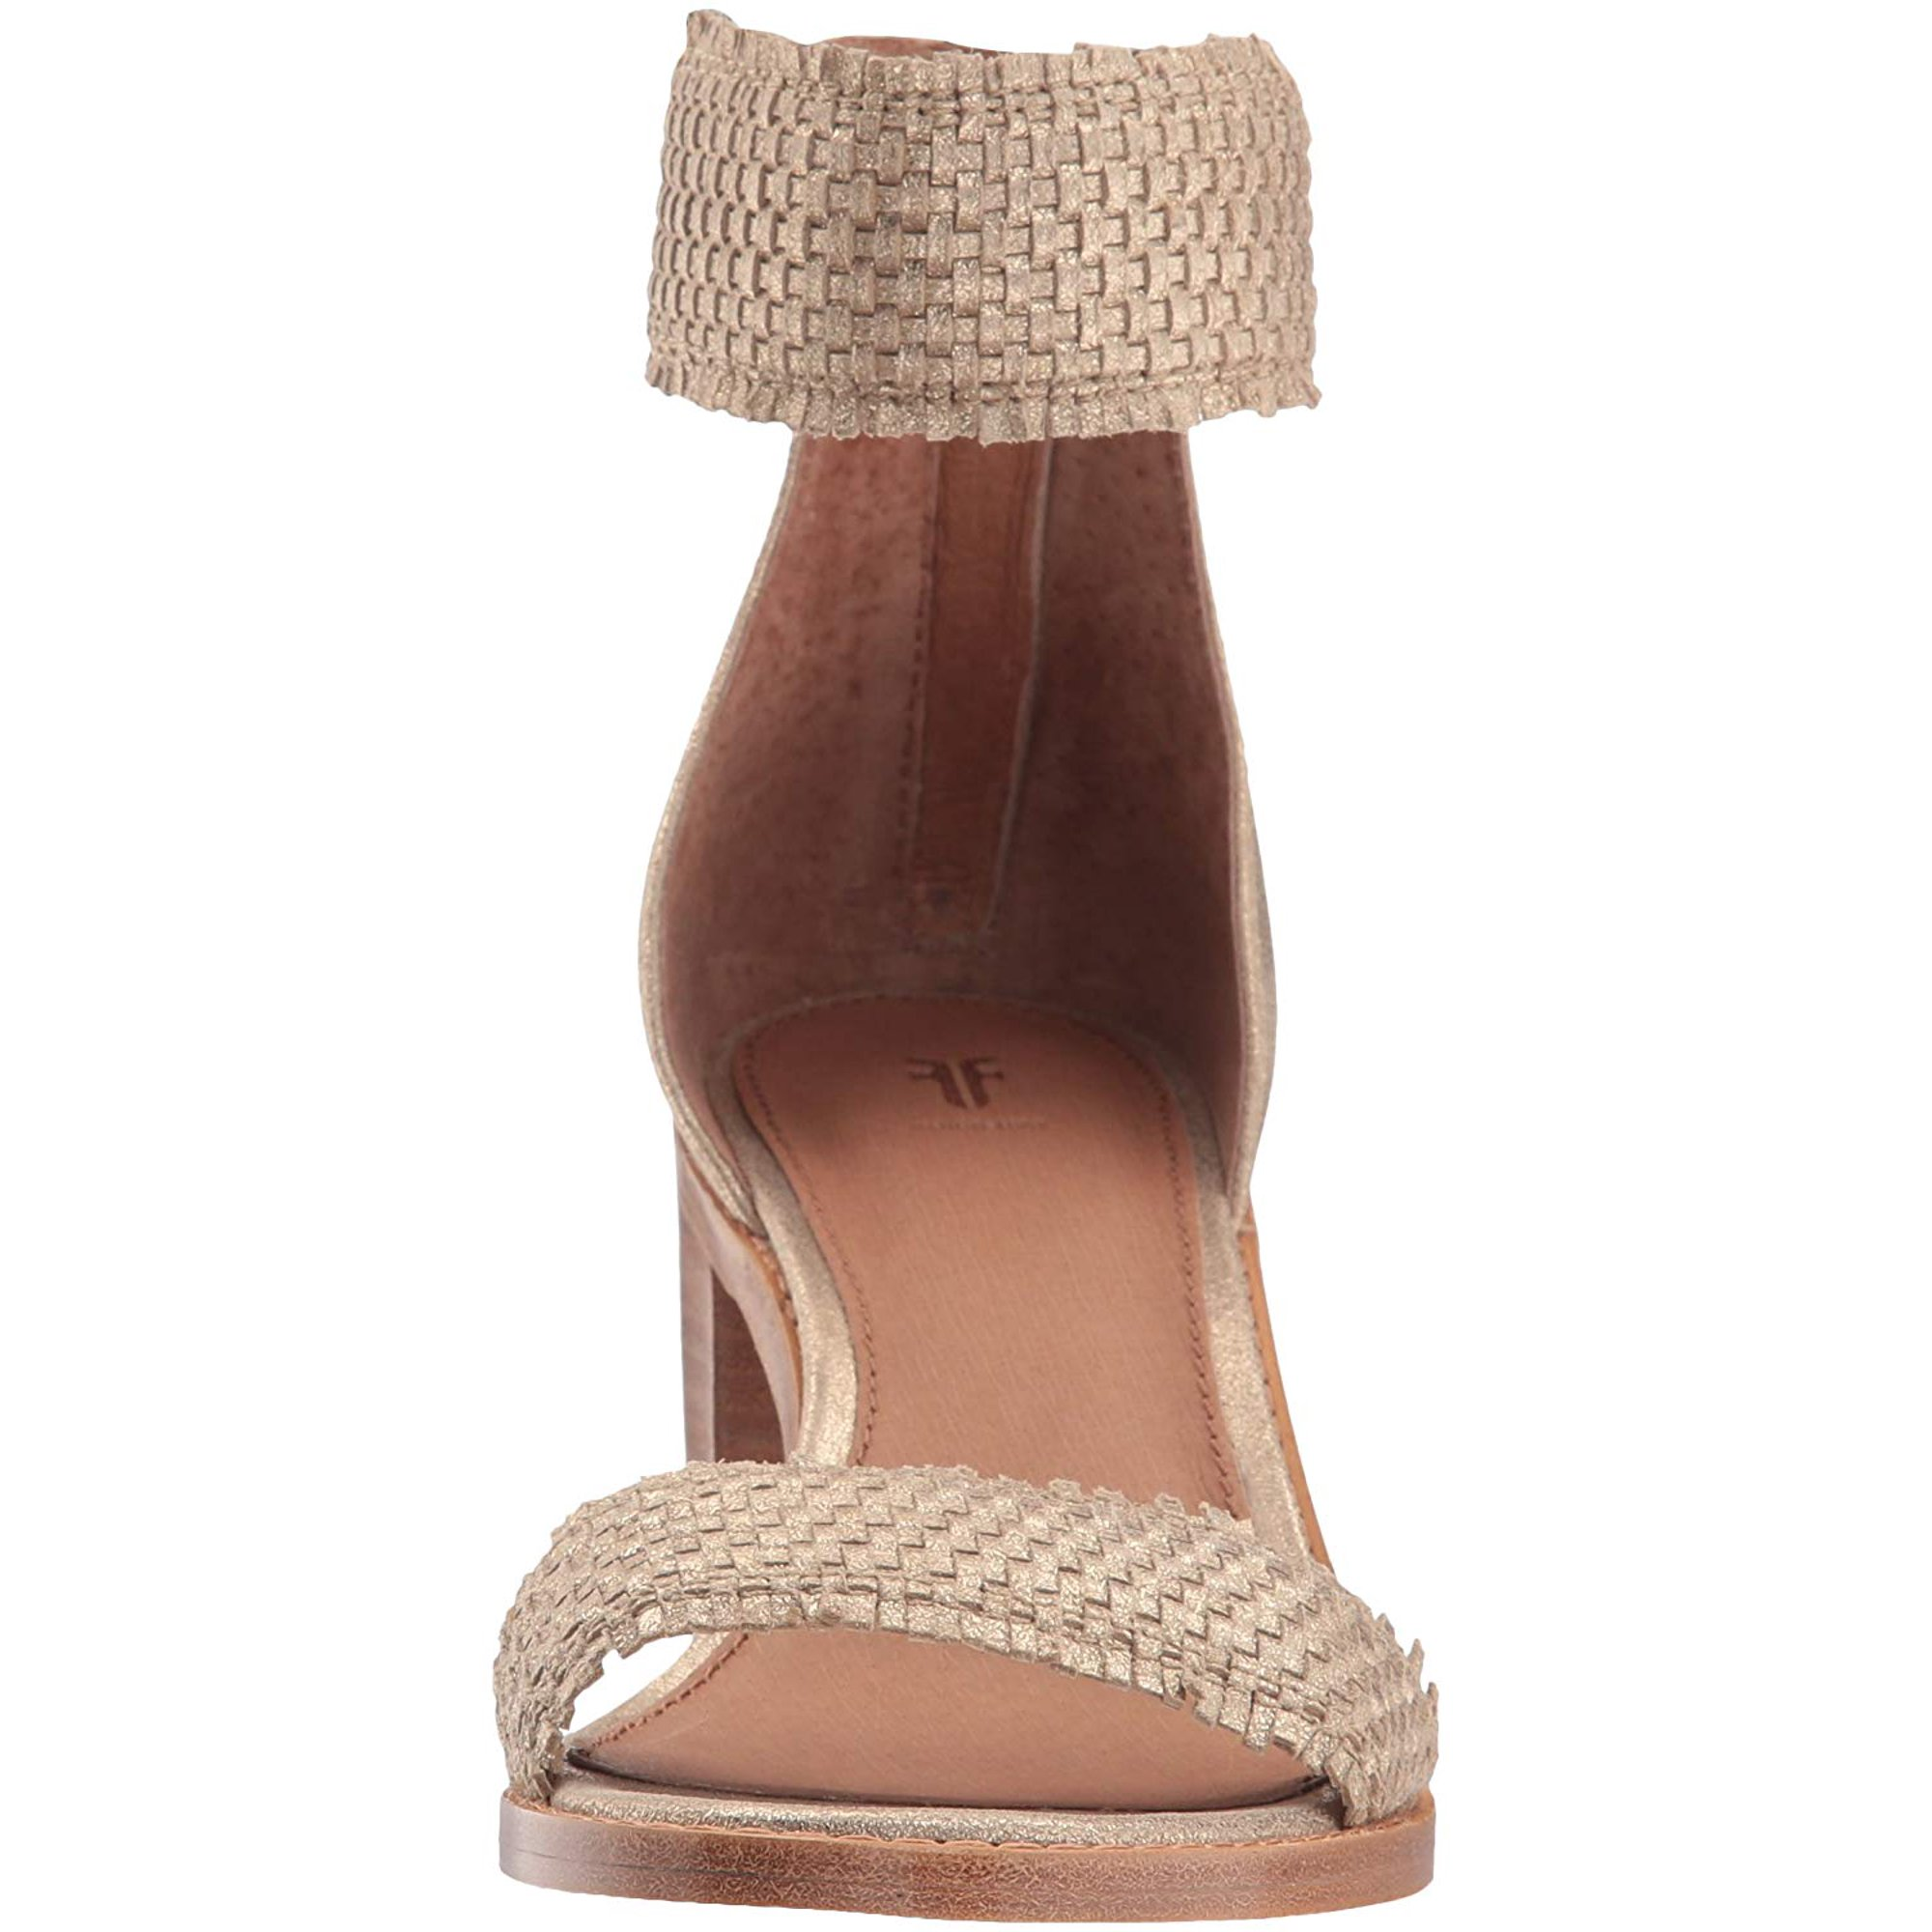 a2ca4af611b3 FRYE Women s Bianca Woven Back Zip Heeled Sandal